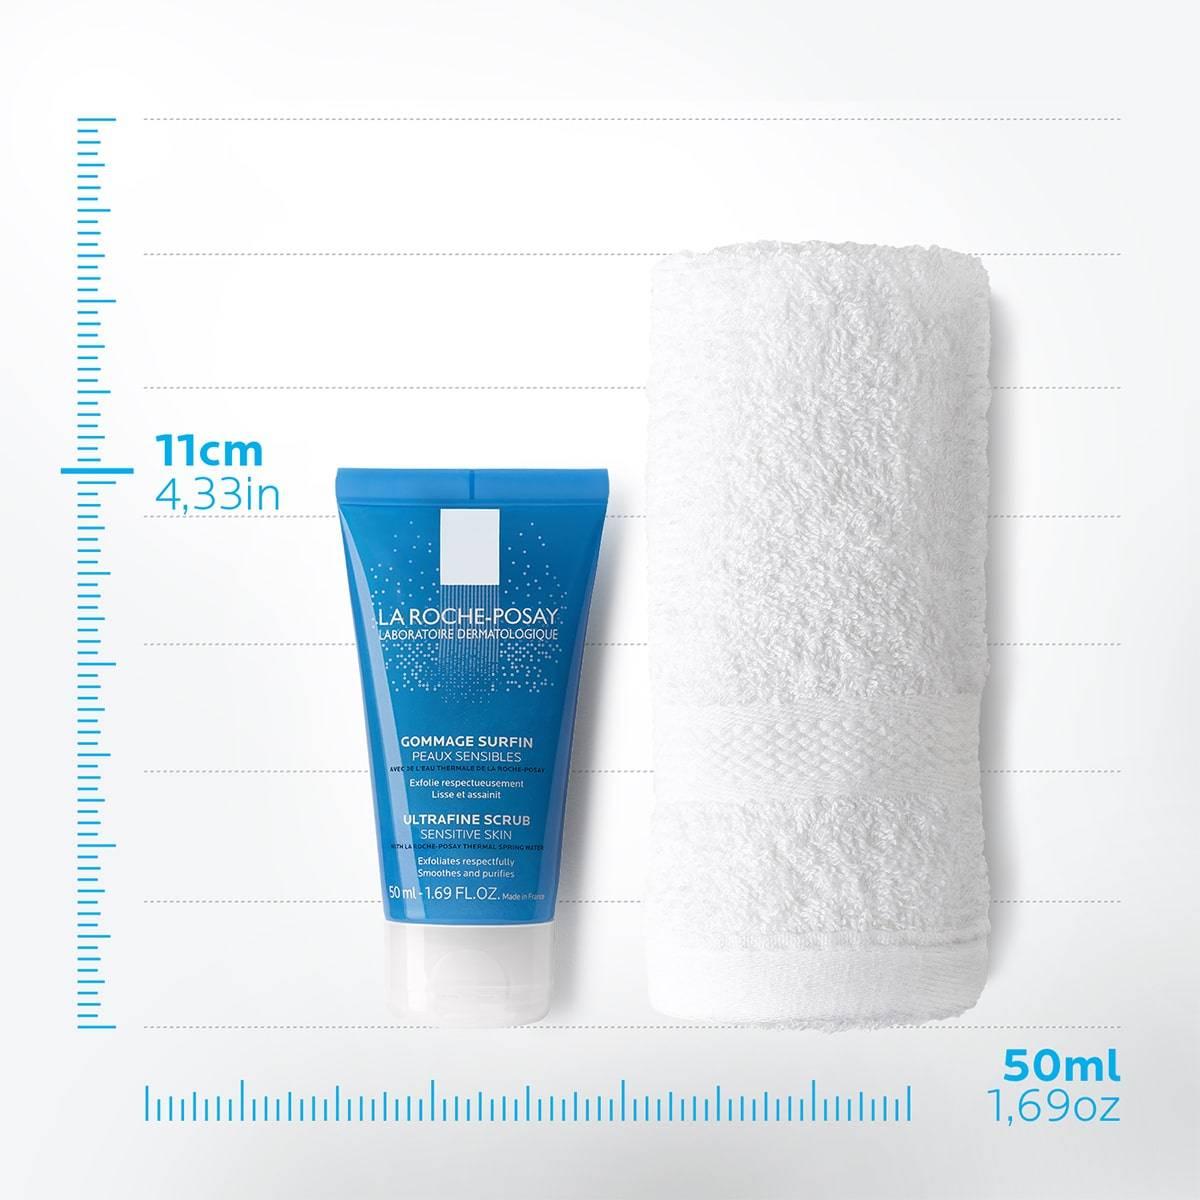 La Roche Posay ProductPage Face Scrub Physiological Ultrafine Scrub 50